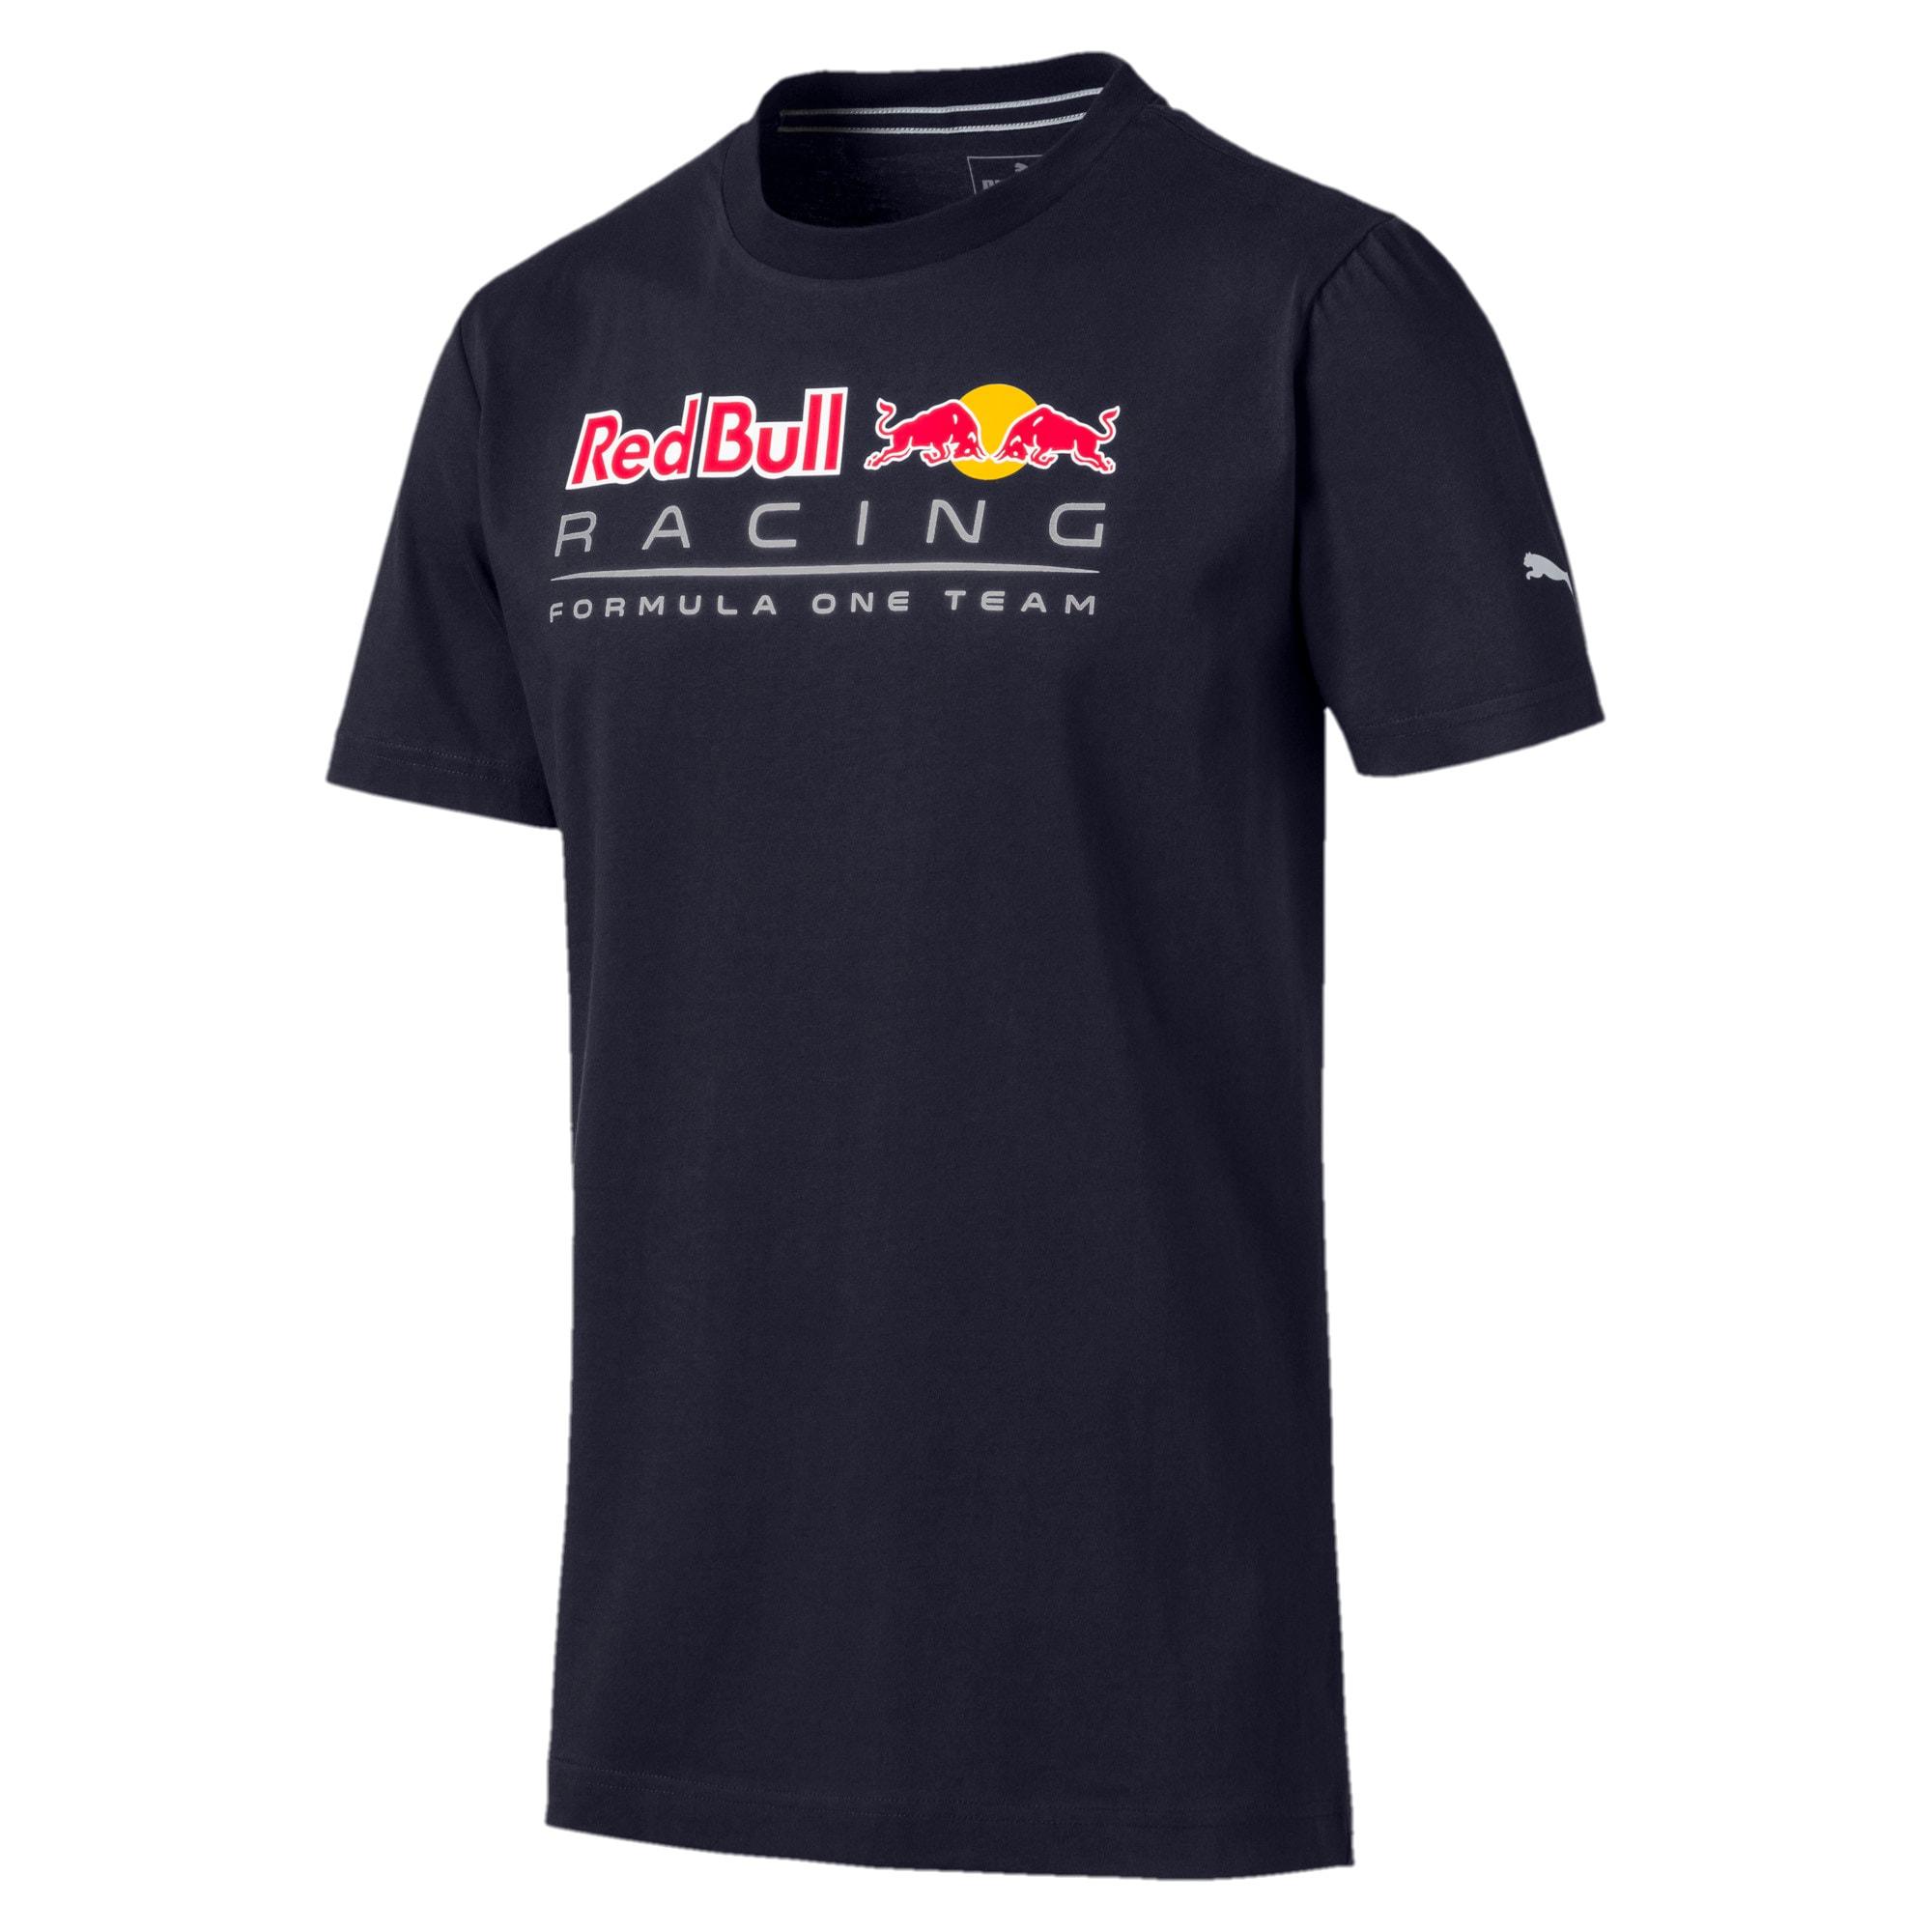 Thumbnail 4 of Red Bull Racing Logo Men's Tee, NIGHT SKY, medium